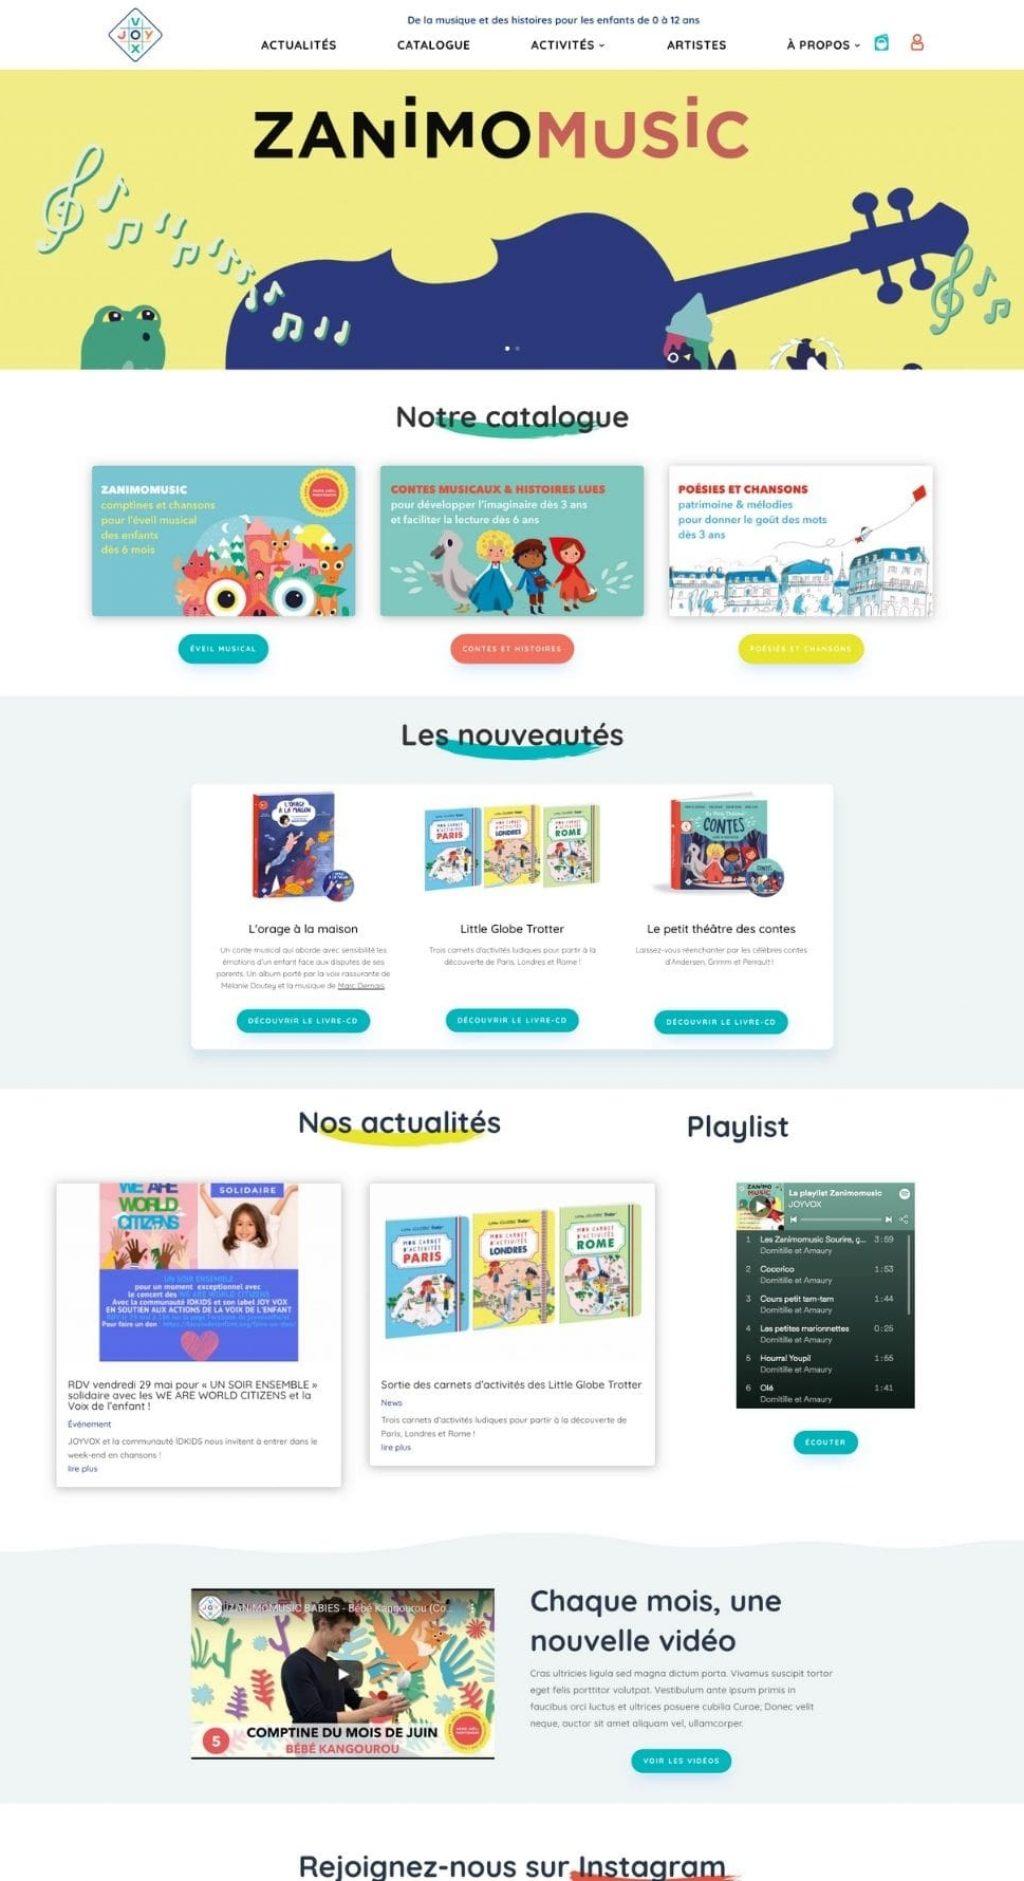 freelance webdesign lille paris wordpress joyvox